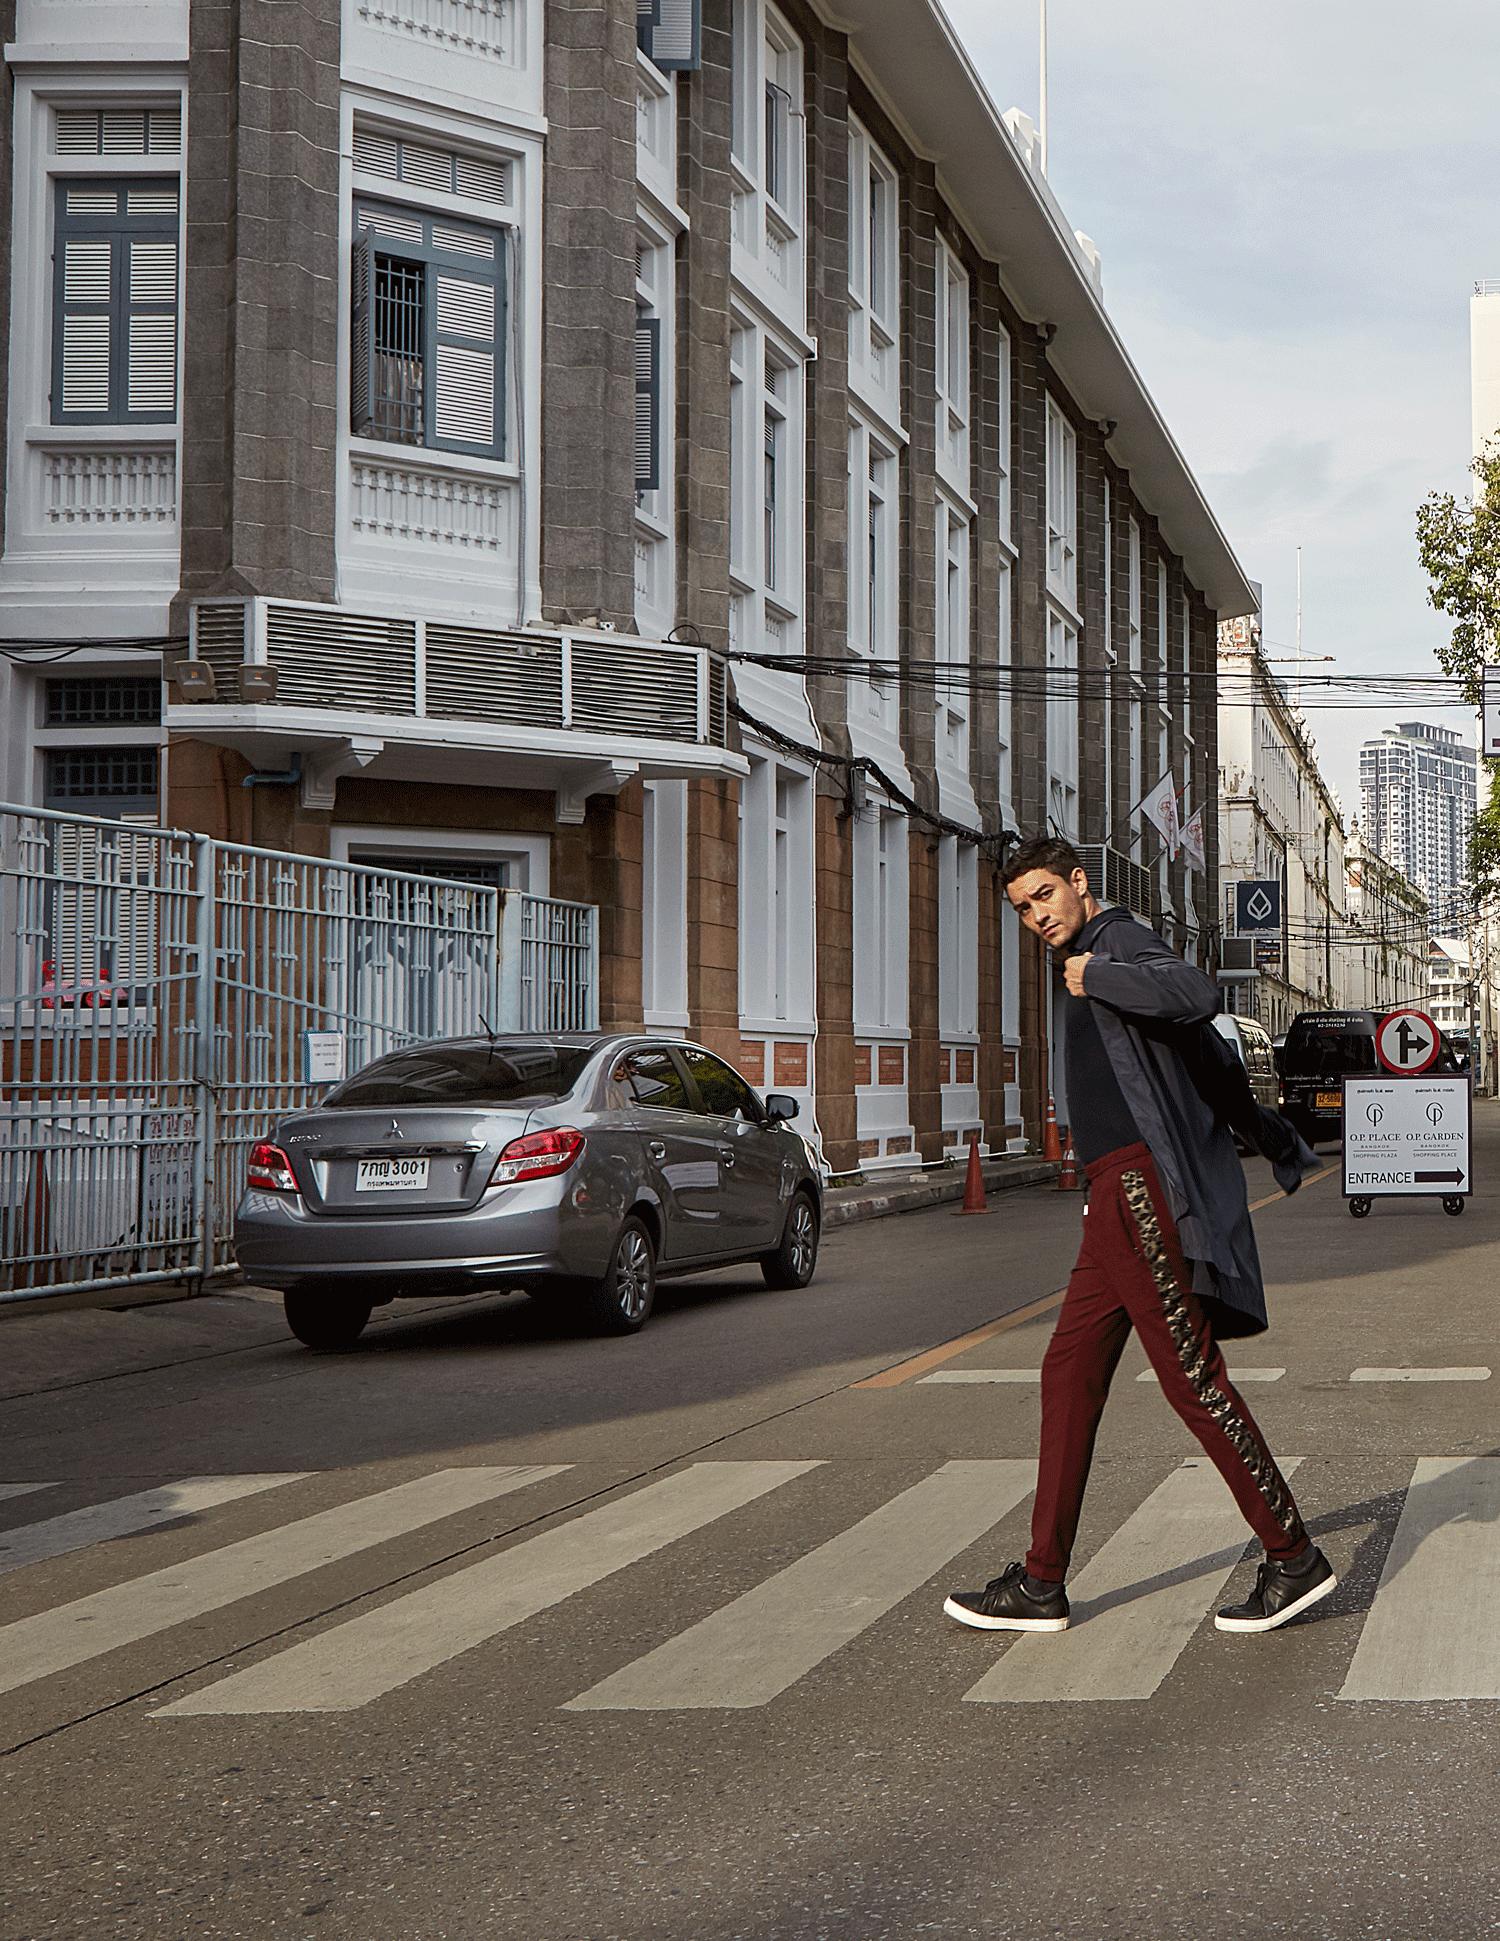 car : Mitsubishi NEW Attrage  shirt : Jil Sander / pants : Theatre / watch : FORREST